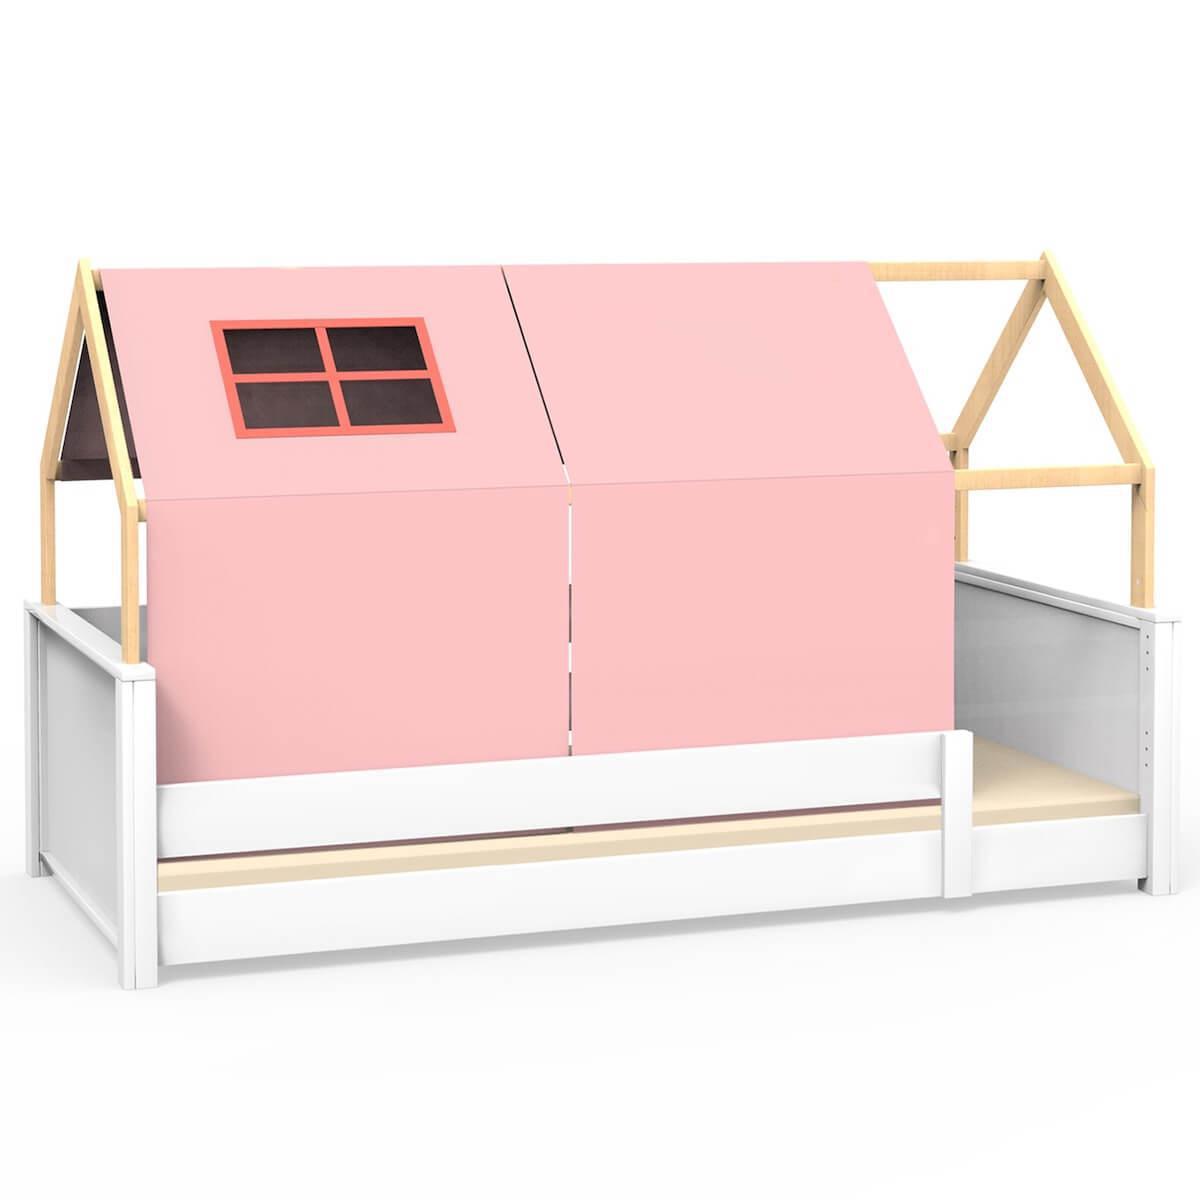 Lit montessori barrière simple cabane KASVA avec textiles Viena pink